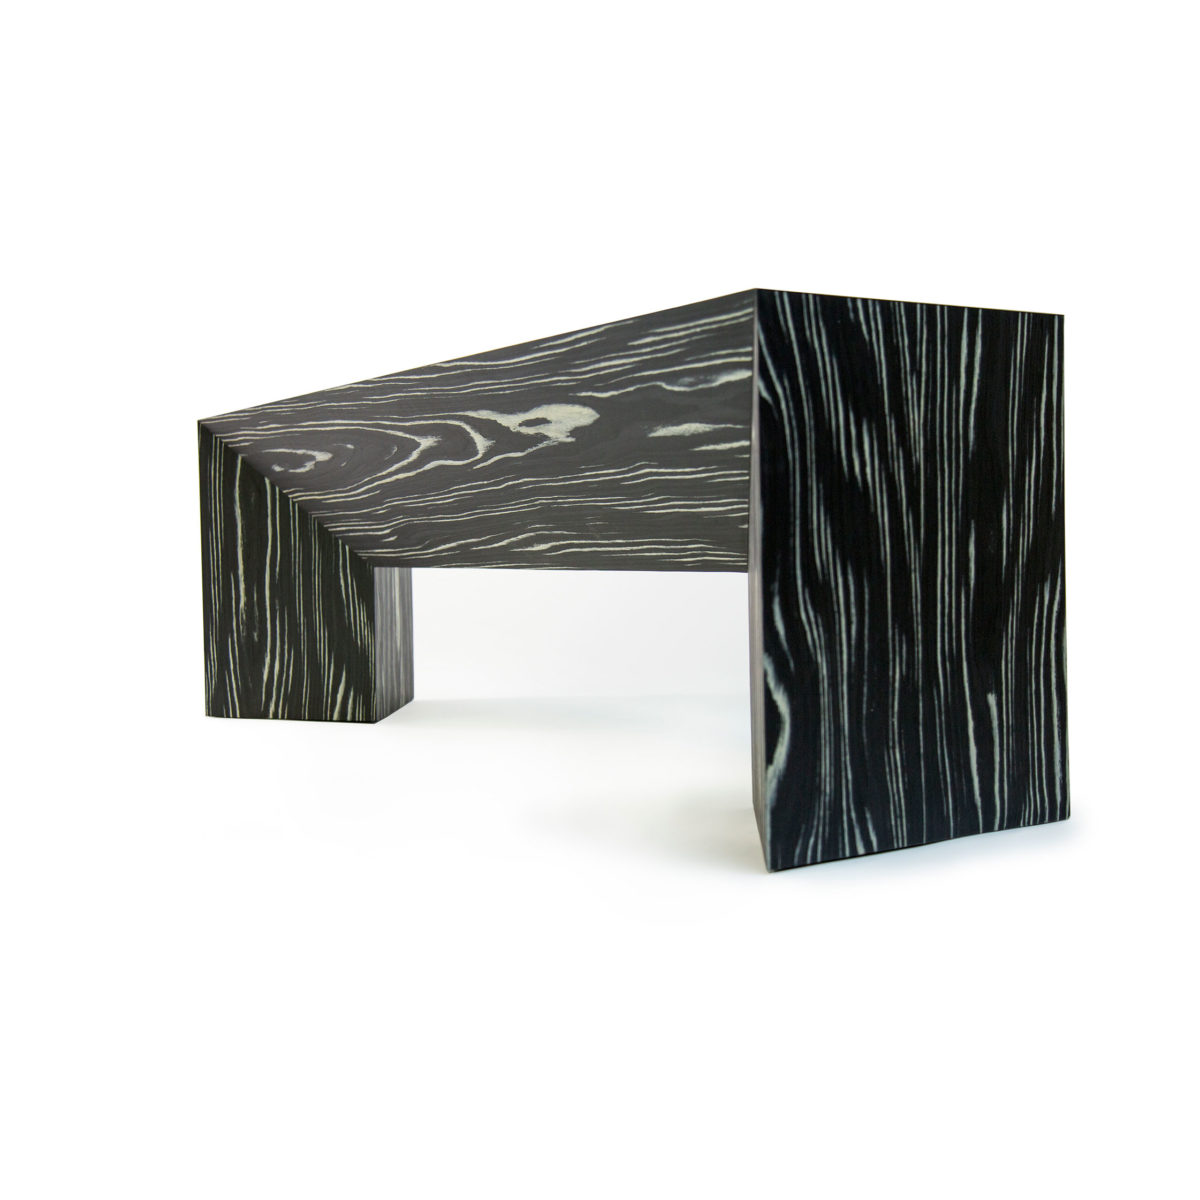 Fold Bench, Photo: fferrone design